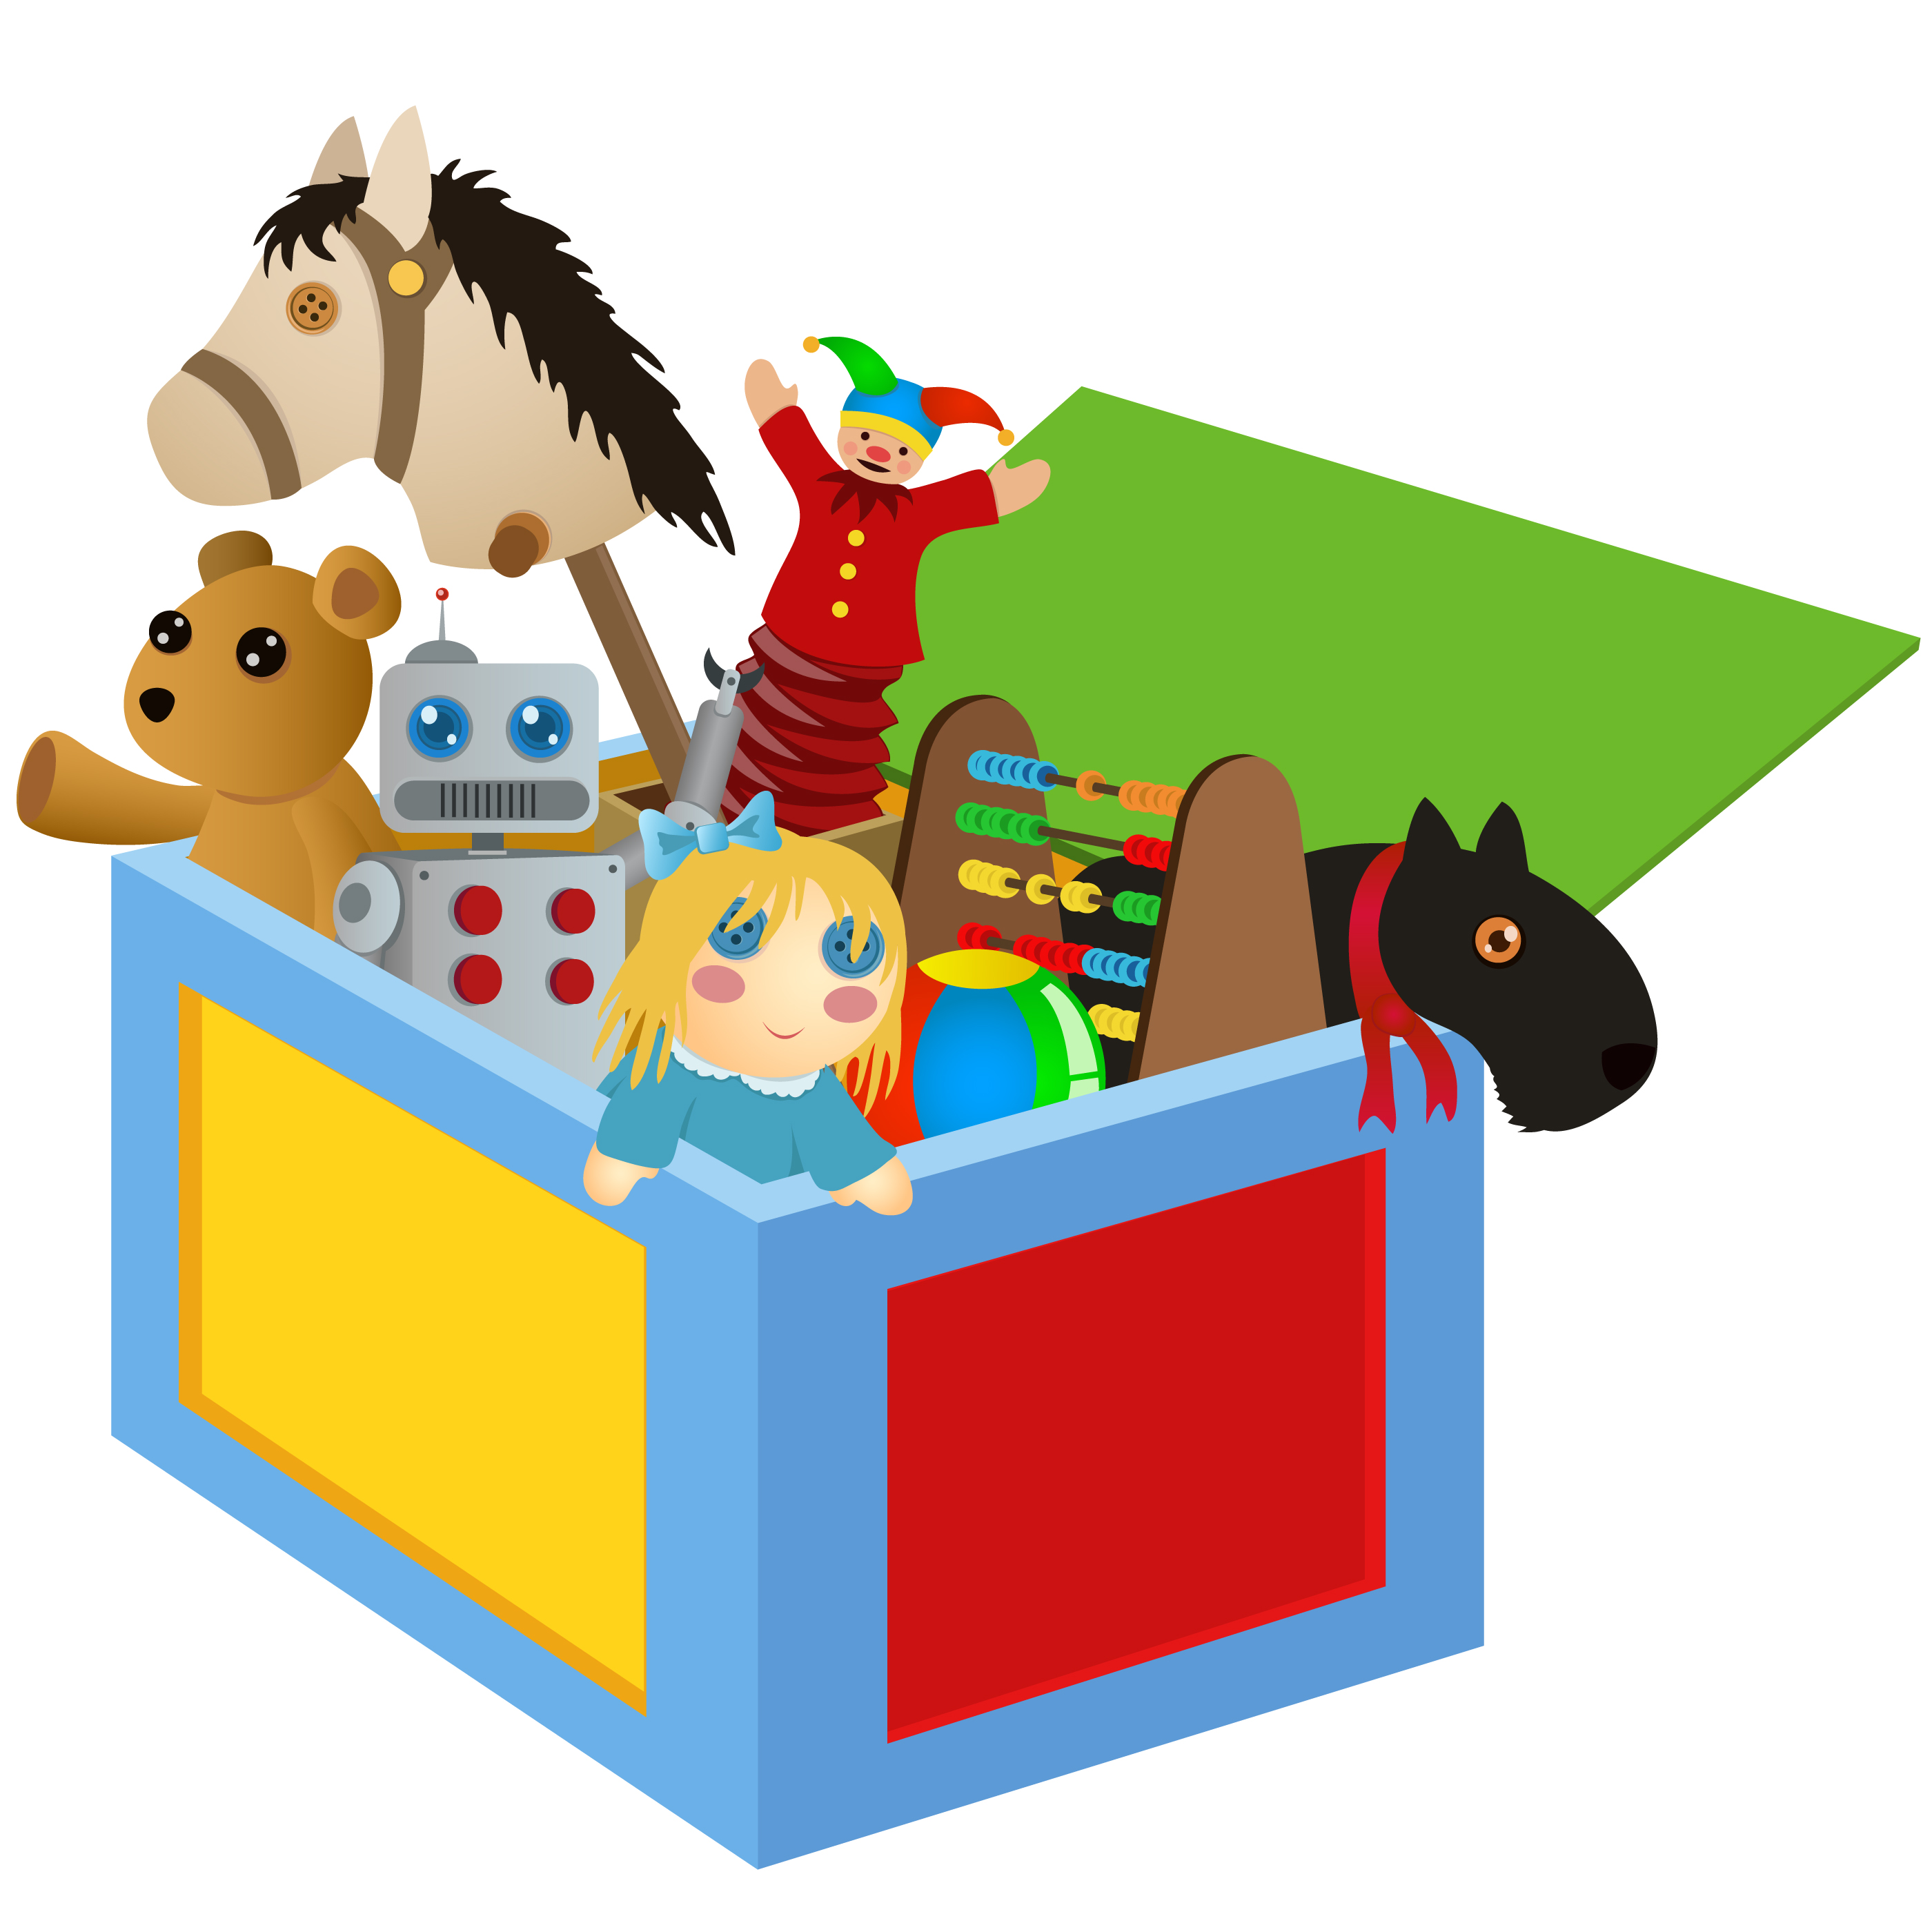 Toy Swap Mercer Island Preschool Associa-Toy Swap Mercer Island Preschool Association-13